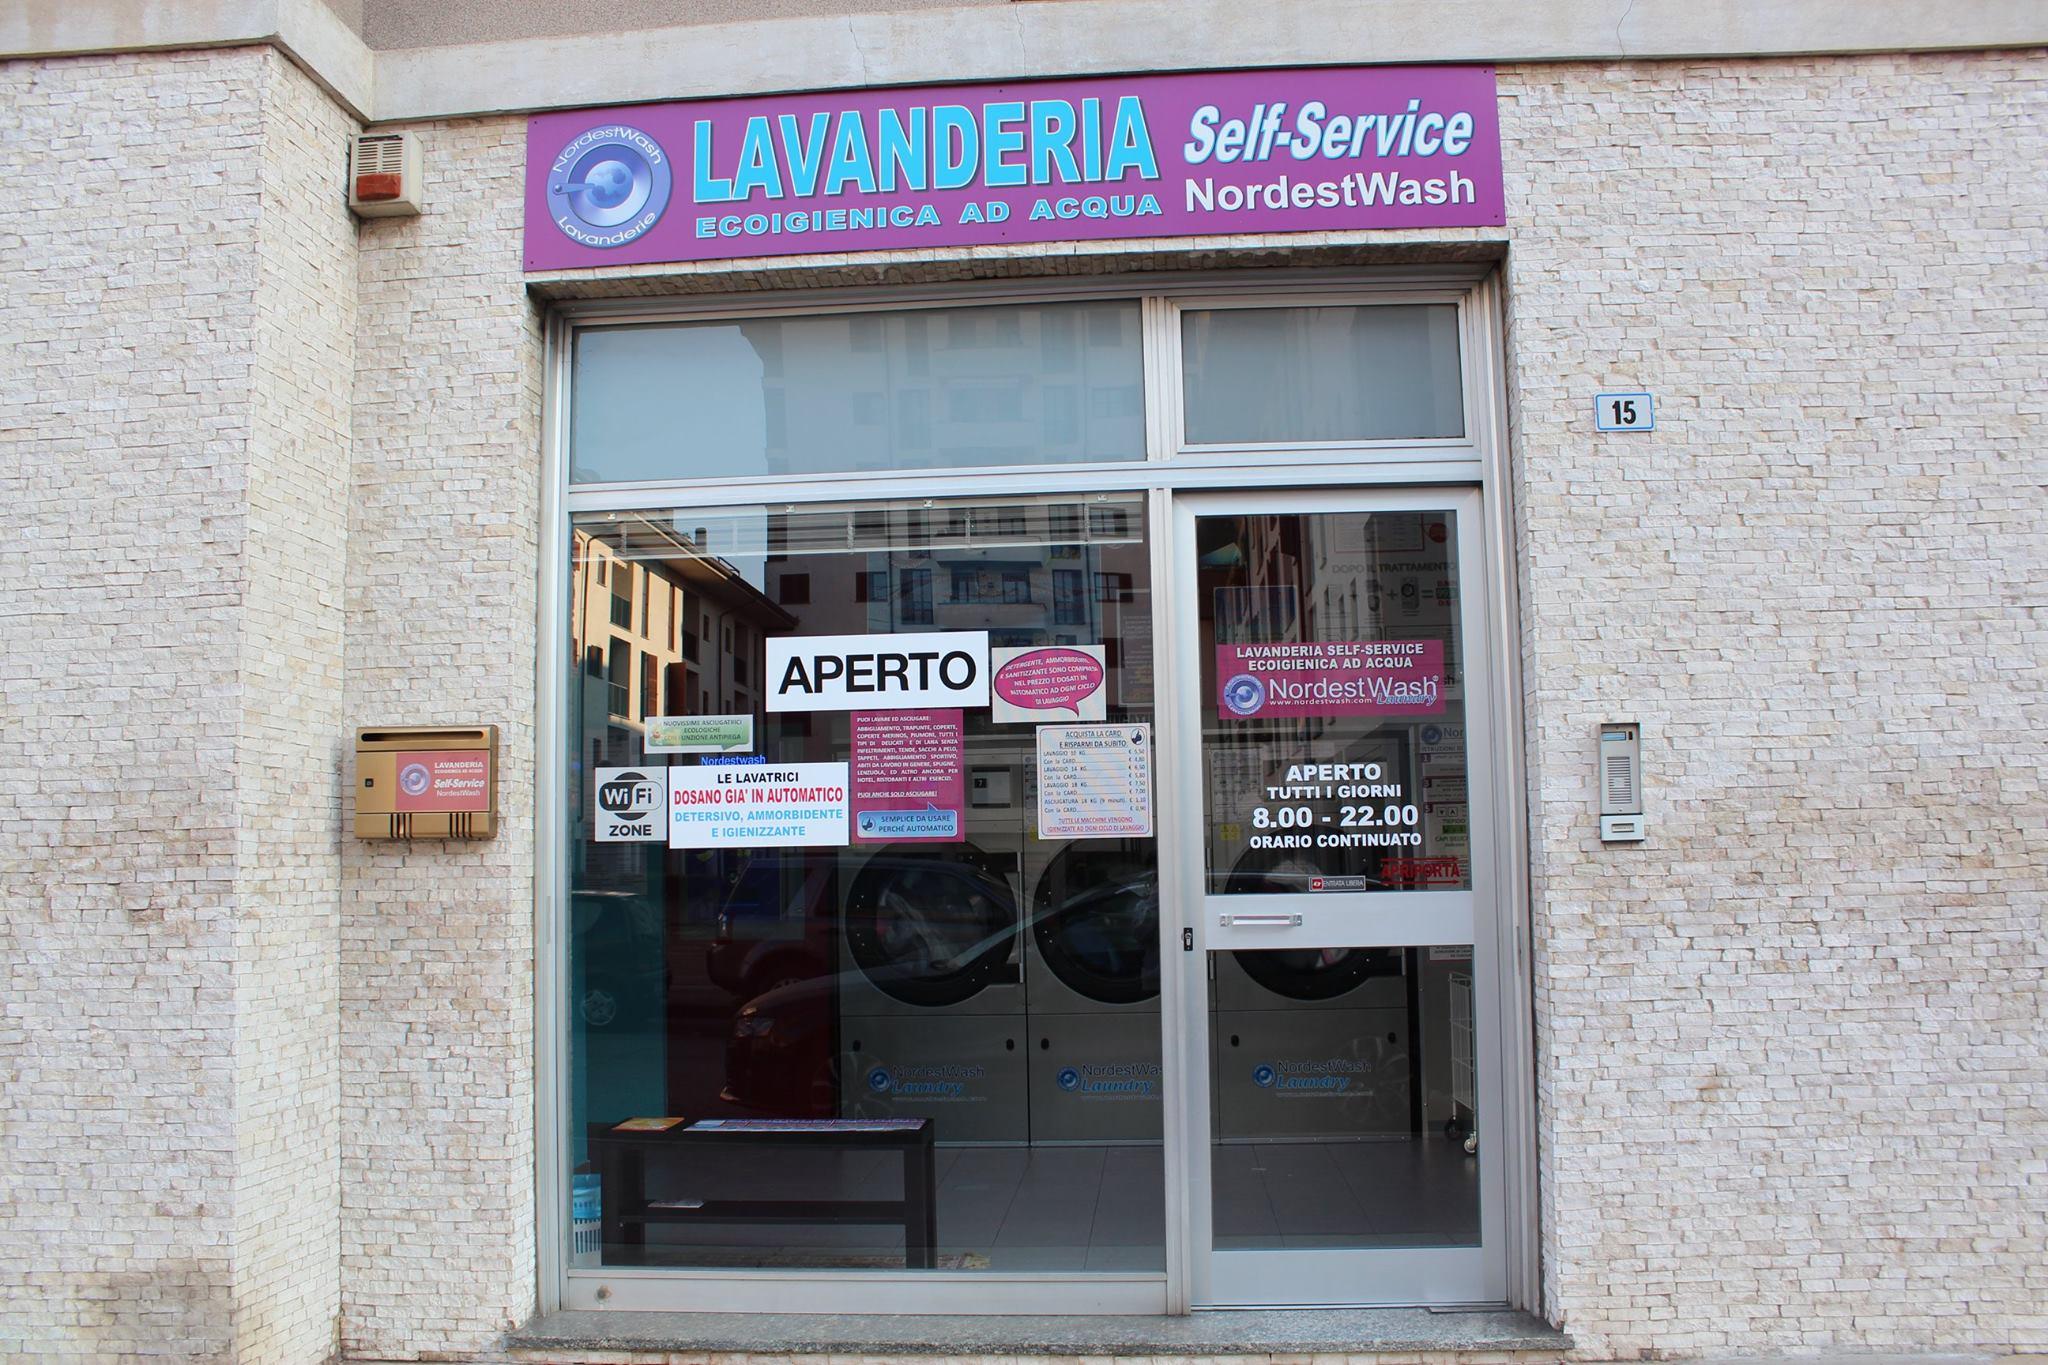 Lavanderia self service nordestwash bollate milano for Lavanderia self service catania